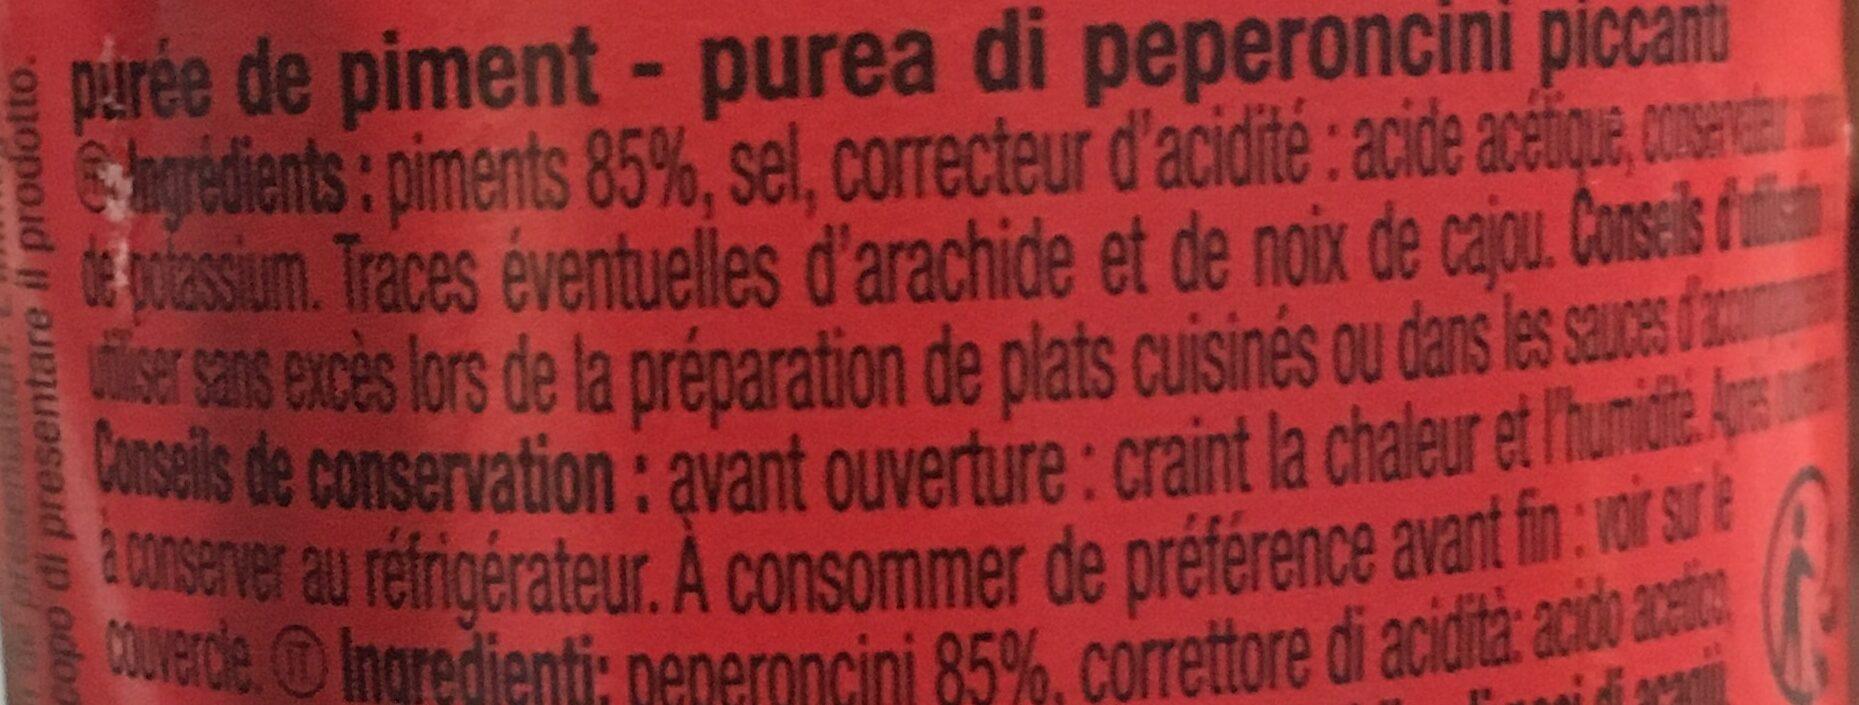 Puree piment - Ingredientes - fr